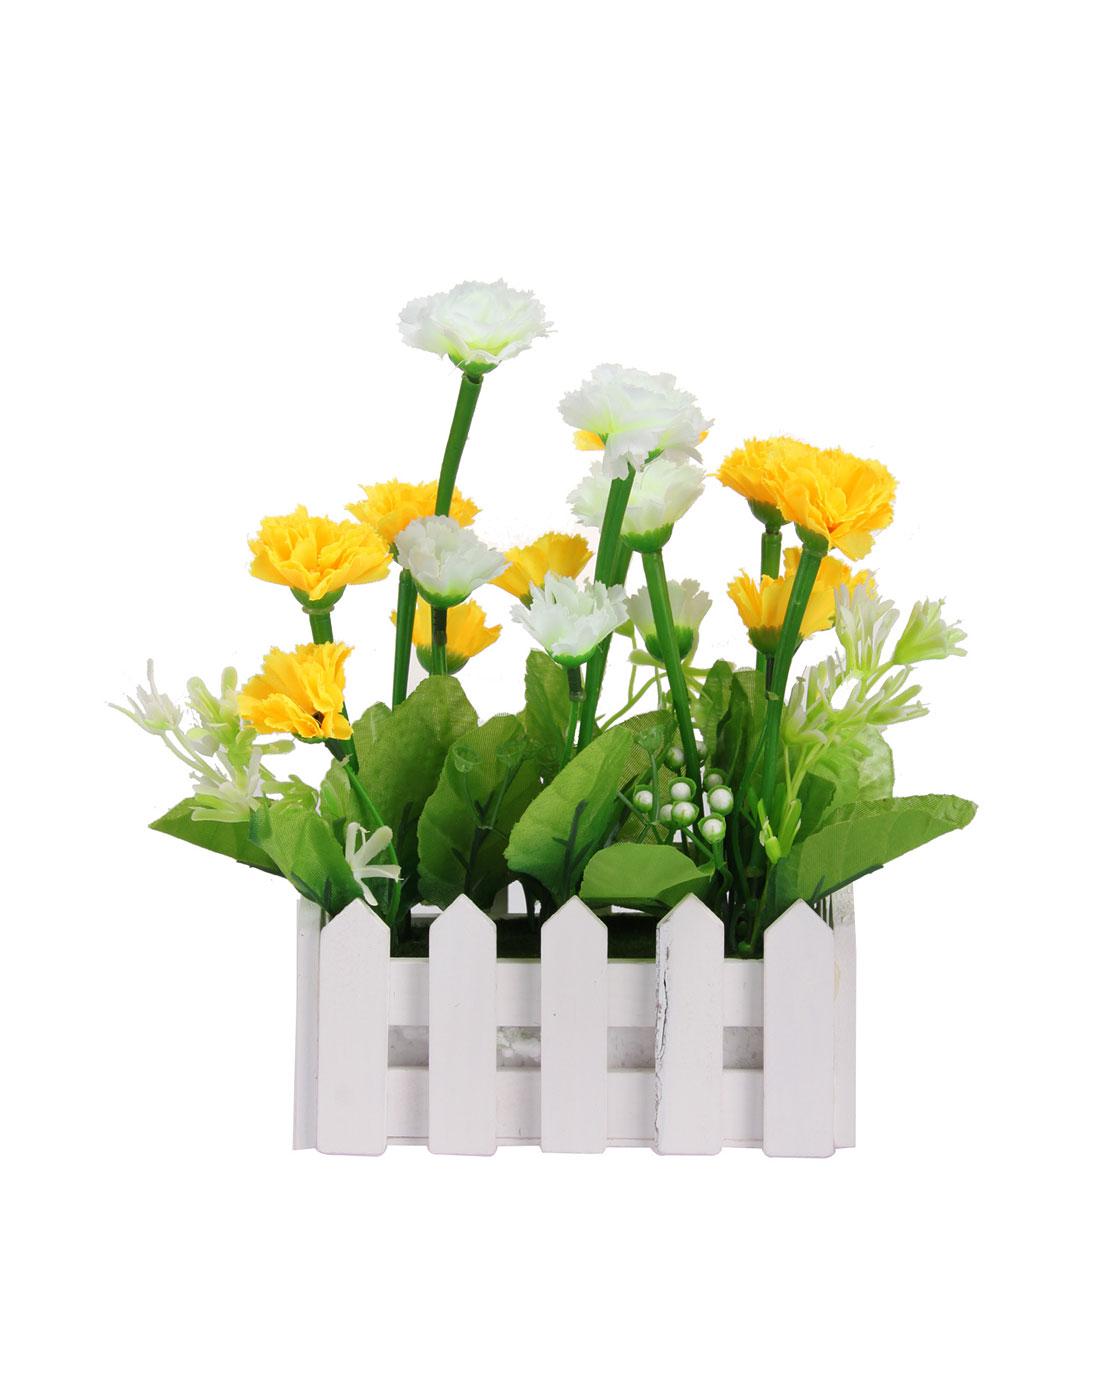 h&3家居用品专场欧式长款栅栏仿真装饰花温馨家园